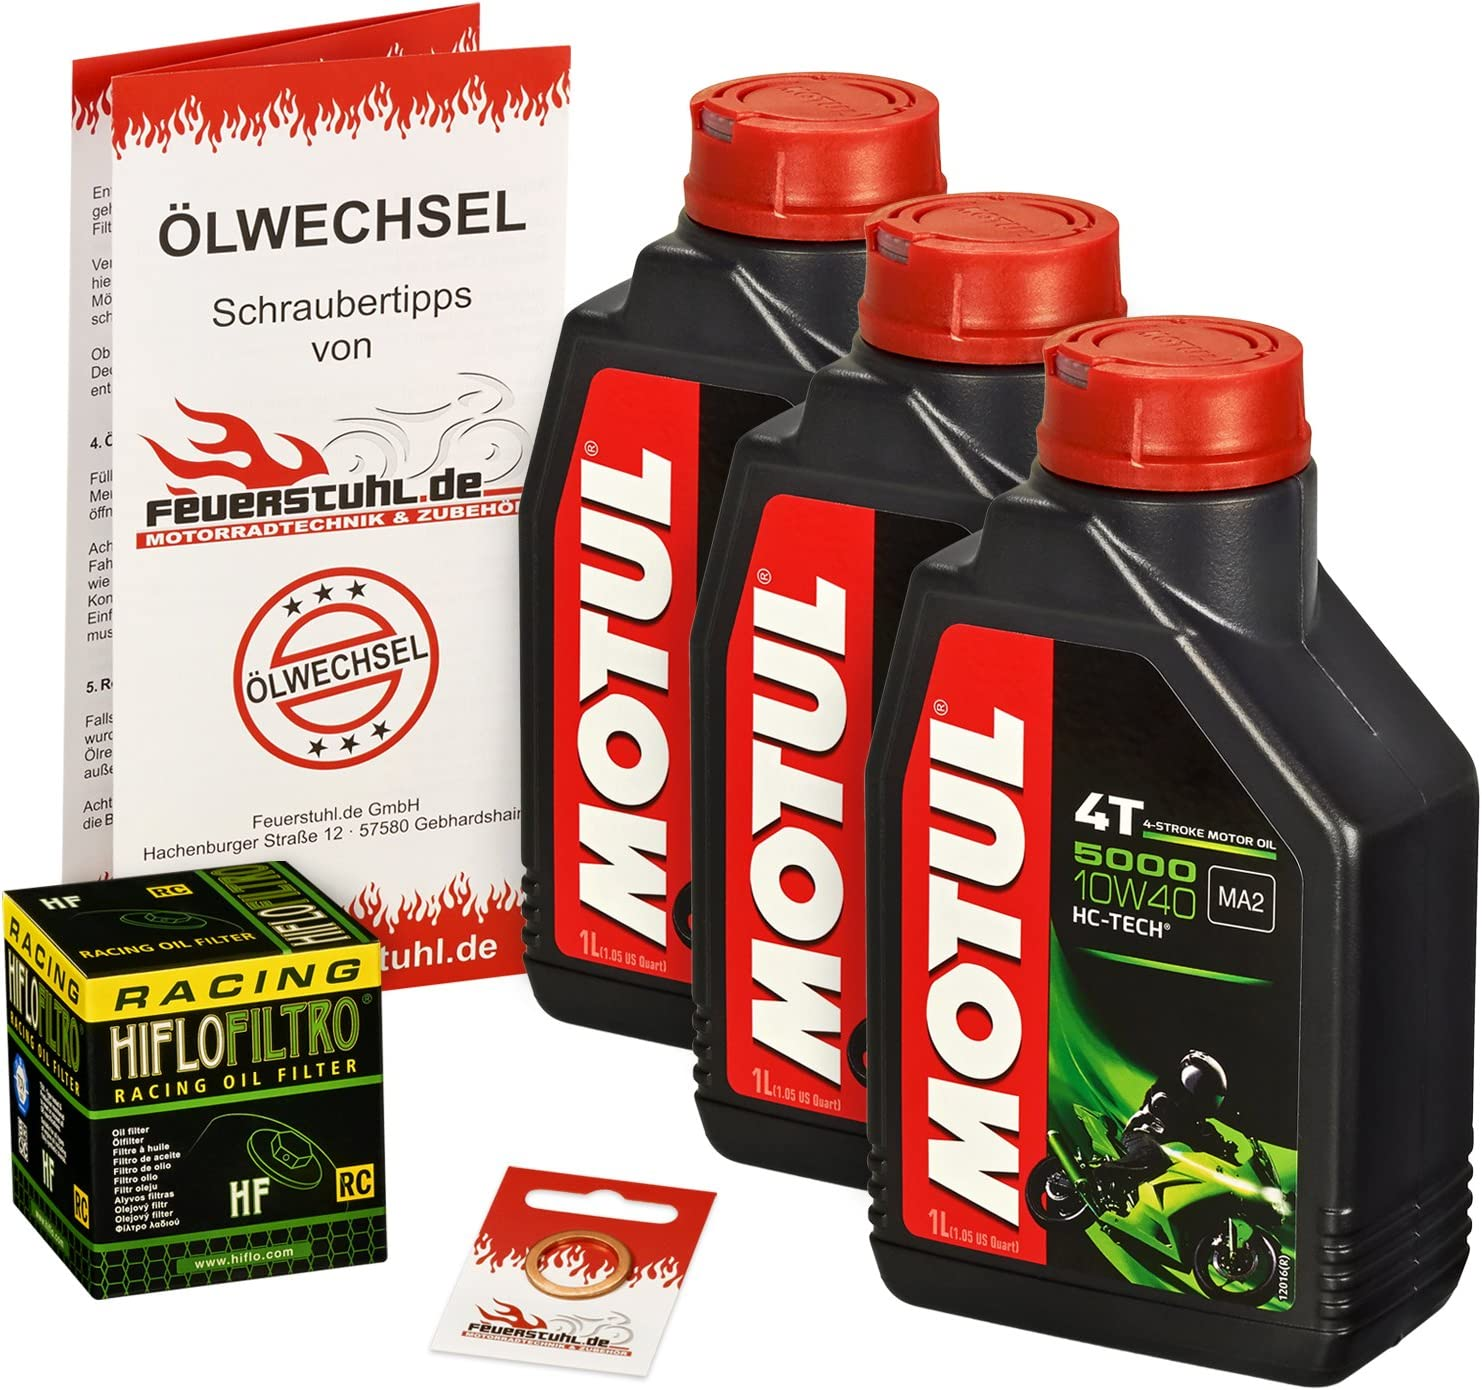 Motul 10w 40 Öl Hiflo Ölfilter Für Suzuki Dl 650 V Strom Xt 04 15 B1 C7 Ölwechselset Inkl Motoröl Racing Filter Dichtring Auto